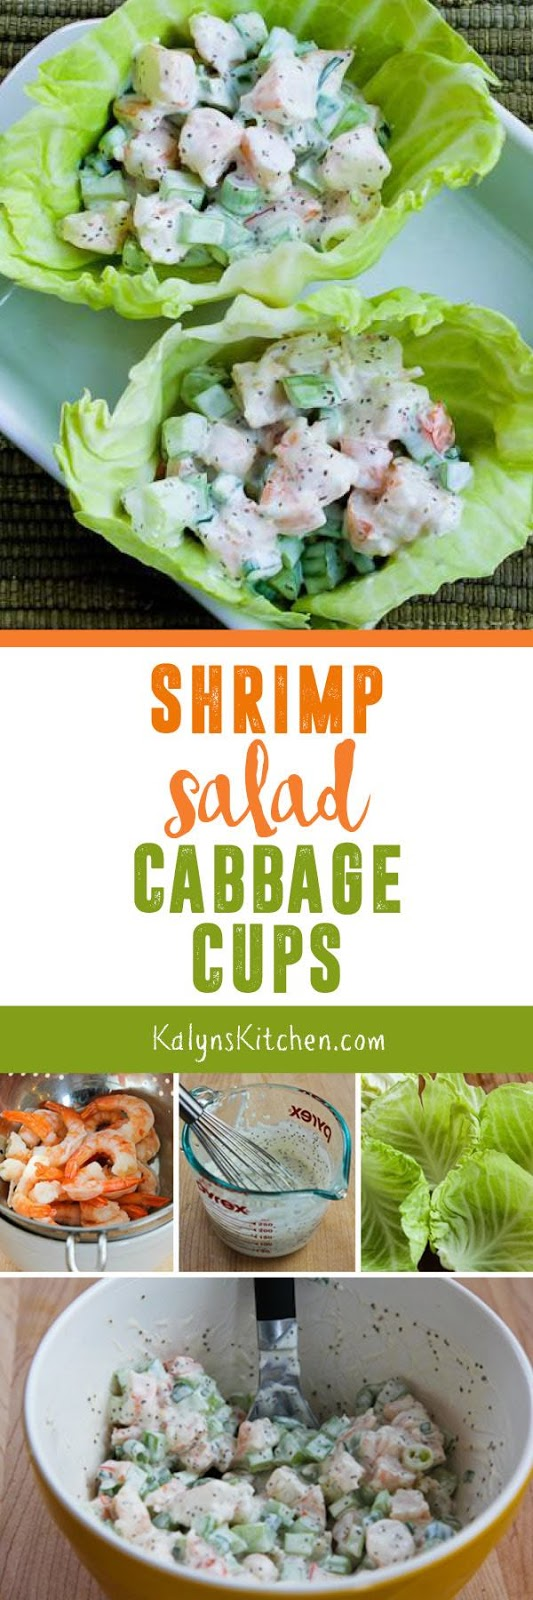 Shrimp Salad Cabbage Cups found on KalynsKitchen.com